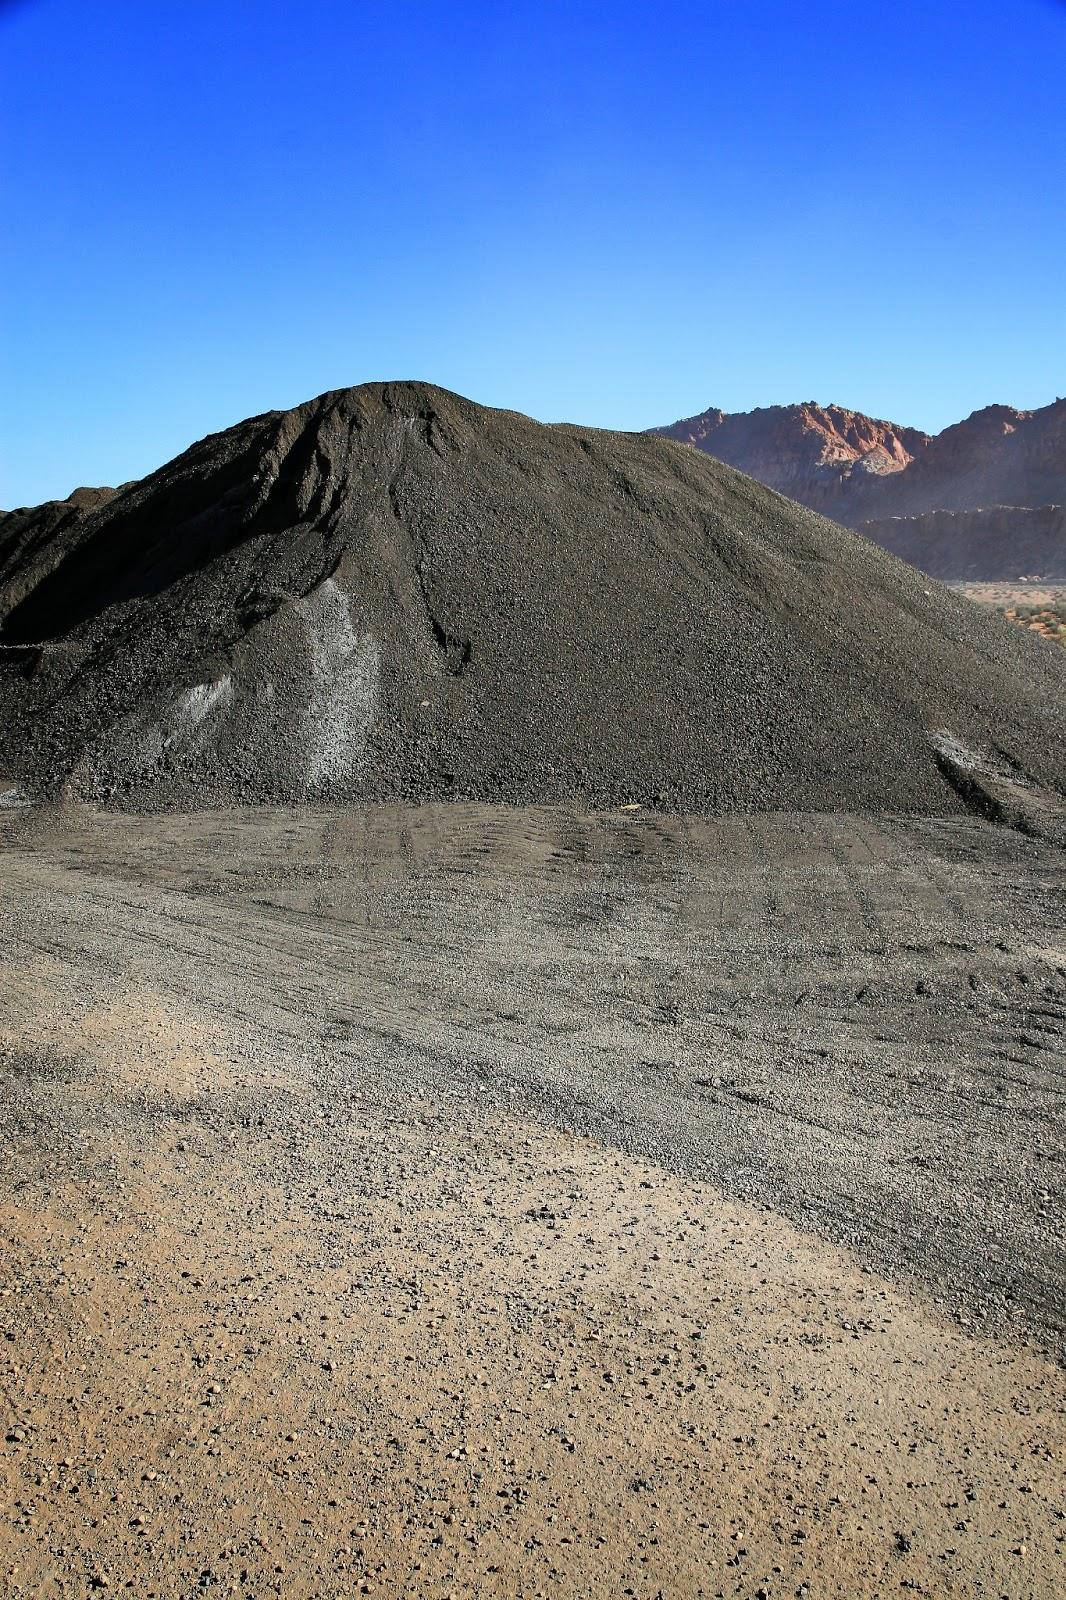 Mound of reclaimed asphalt pavement